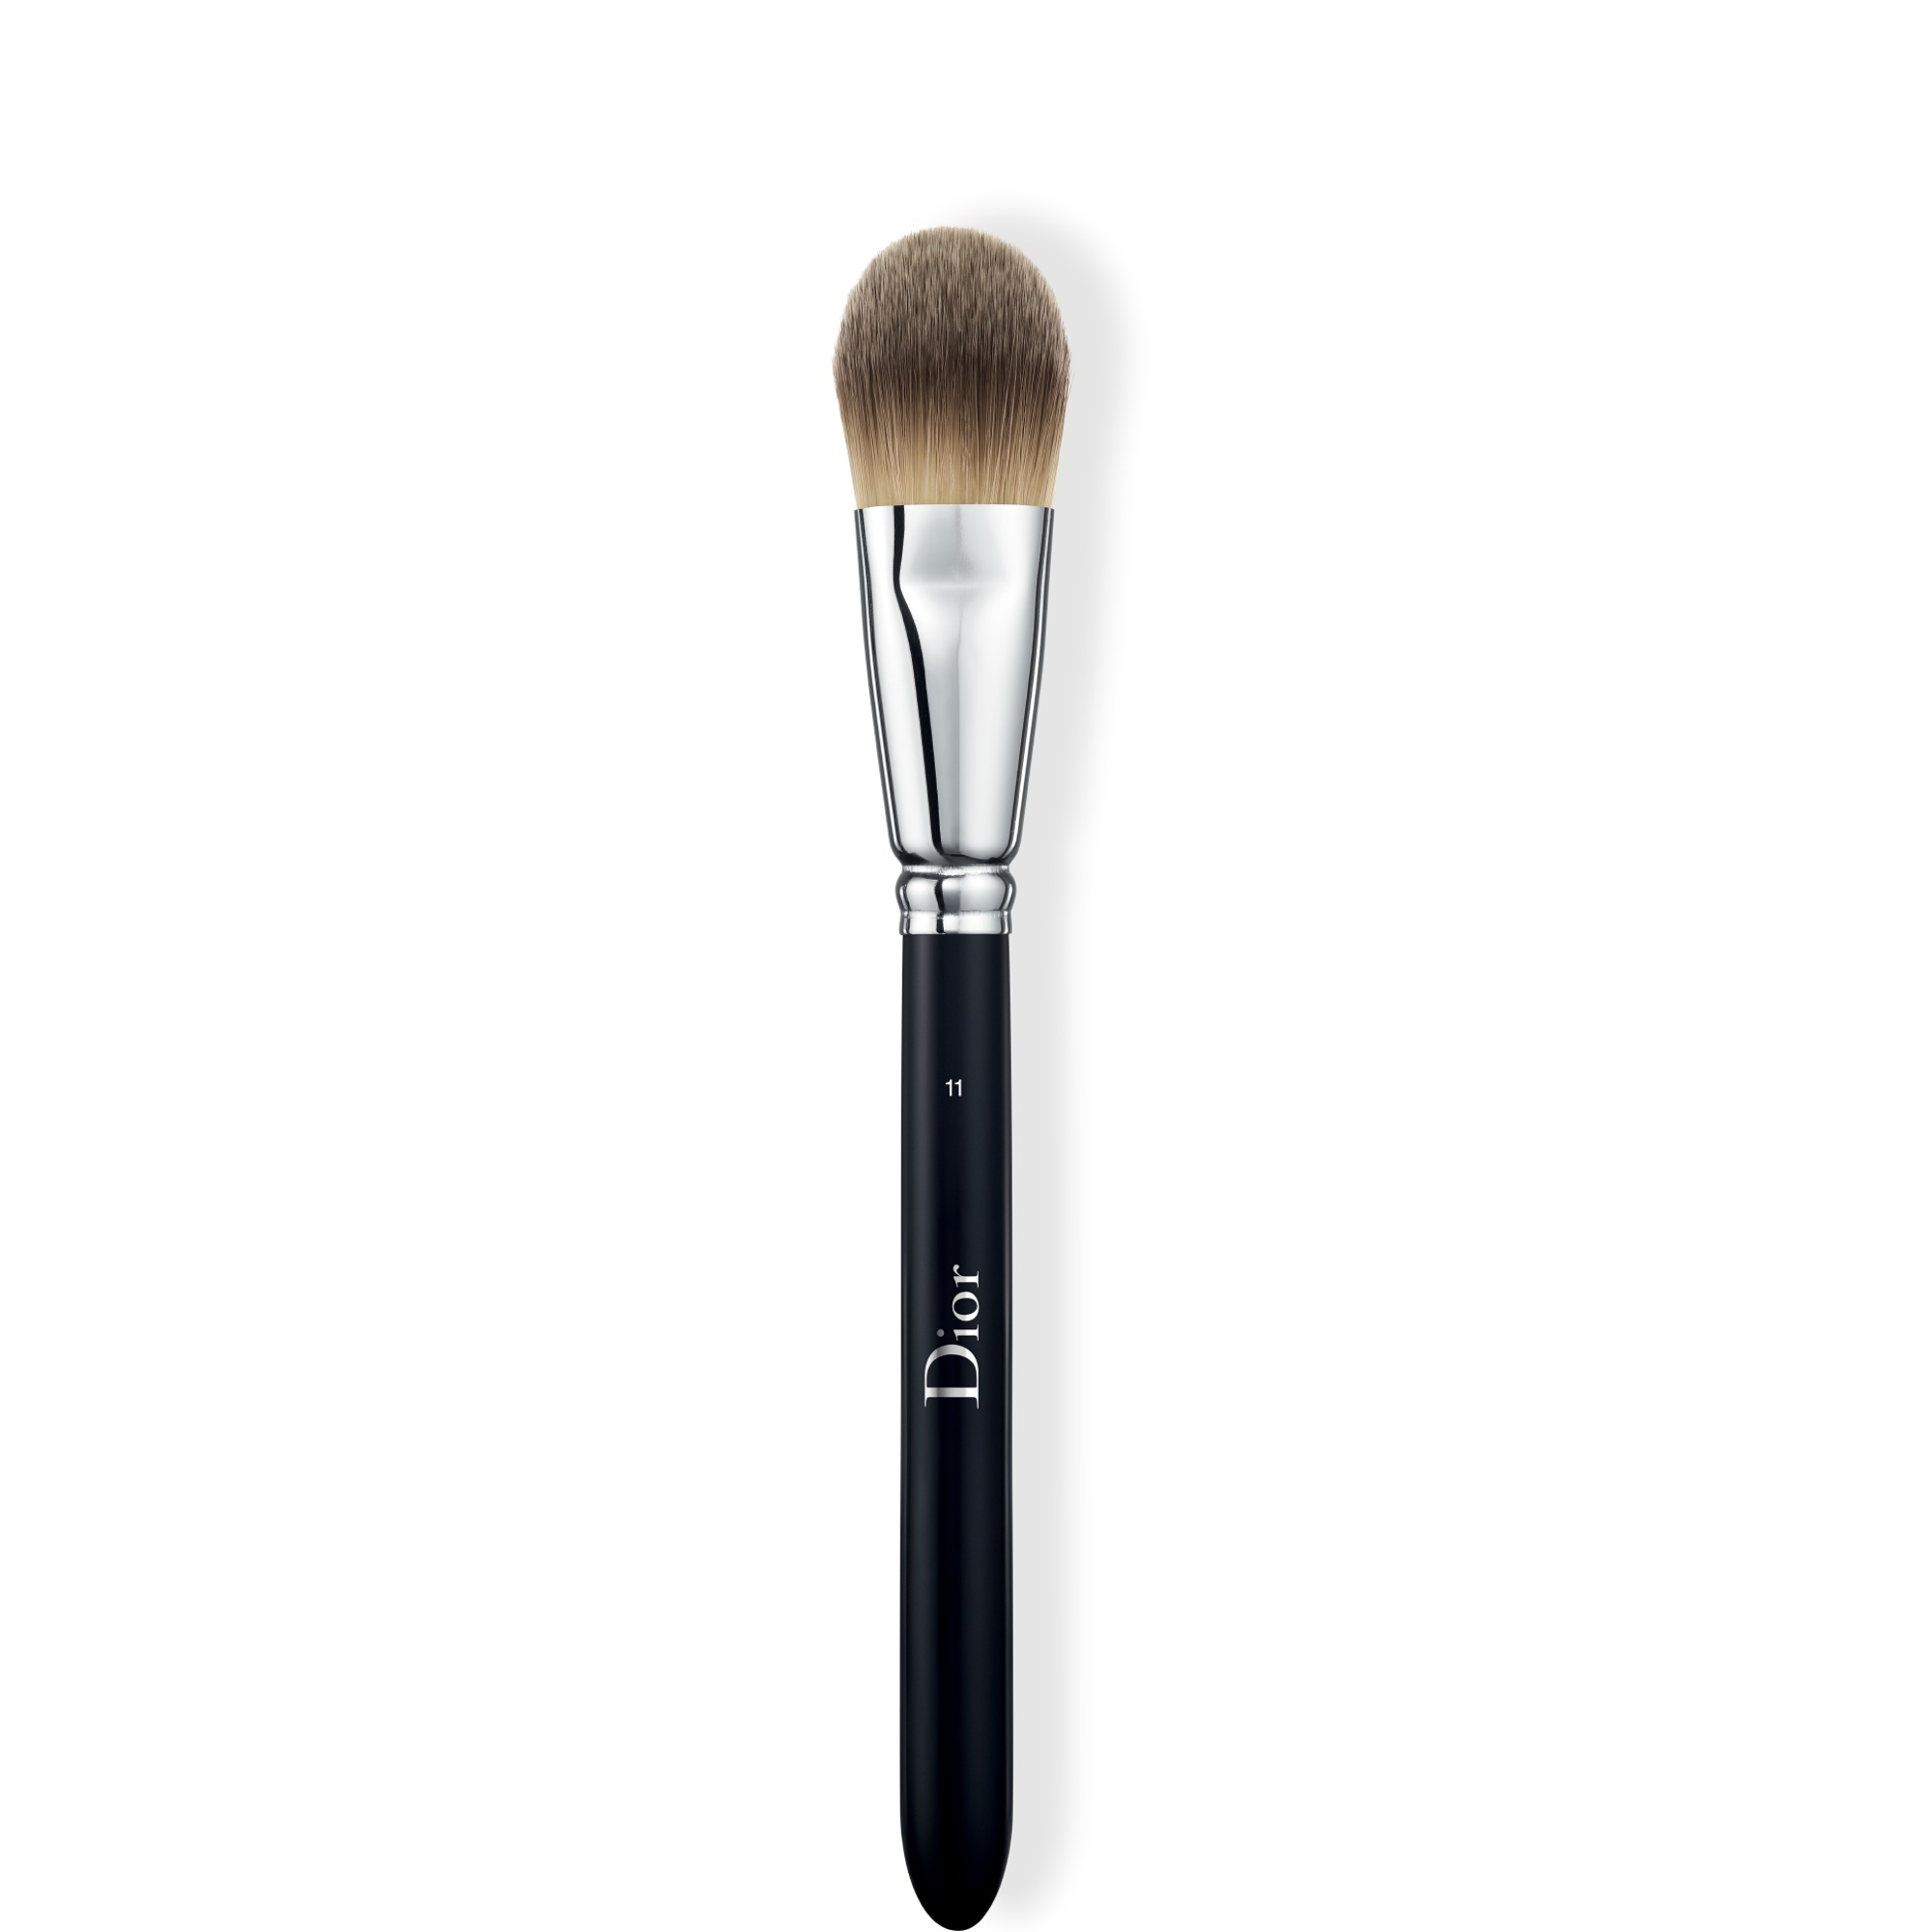 Light Coverage Fluid Foundation Brush N°11